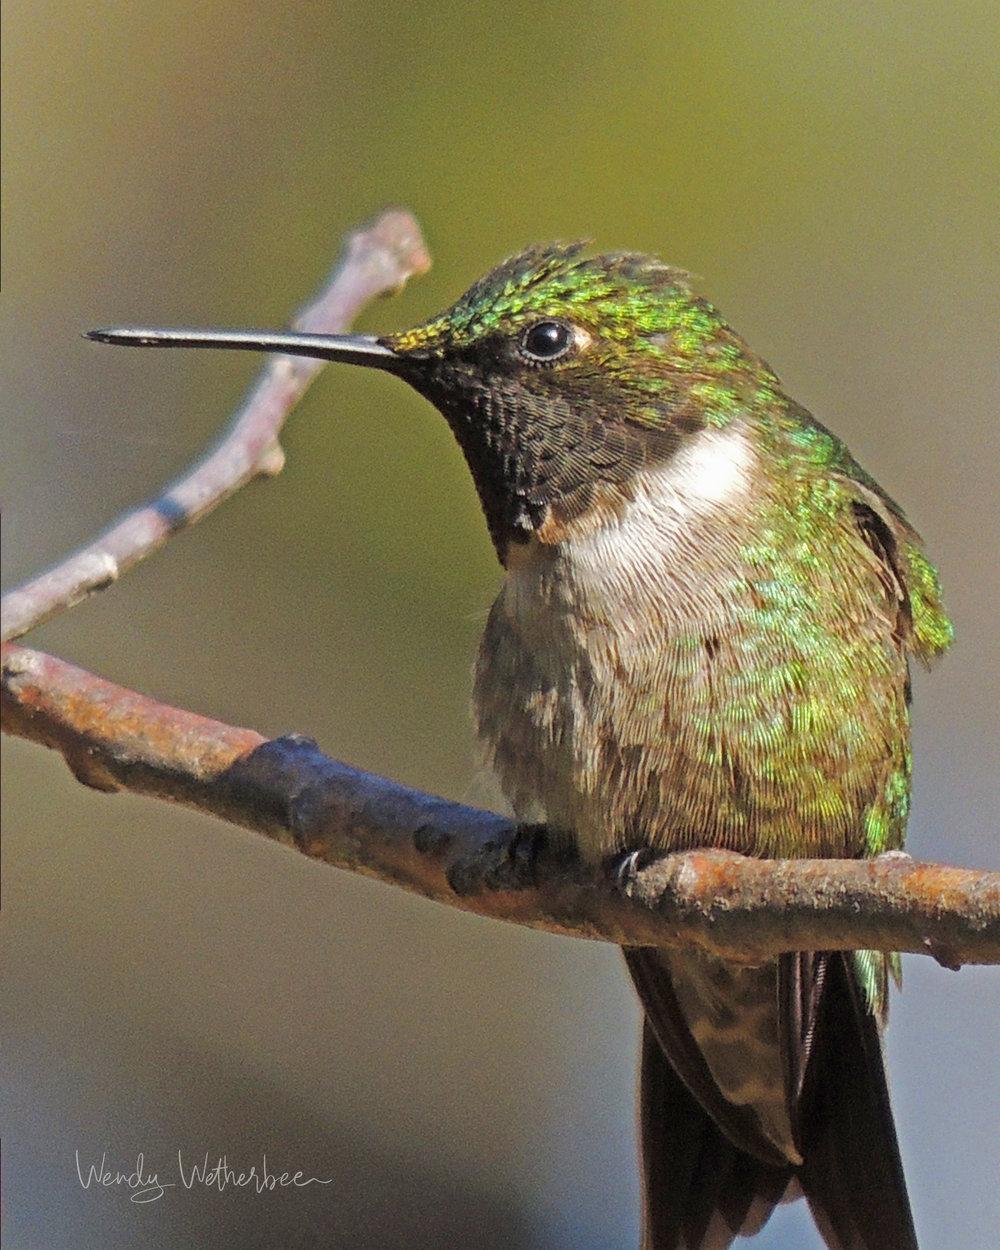 Portrait of a Hummingbird ©Wendy Wetherbee